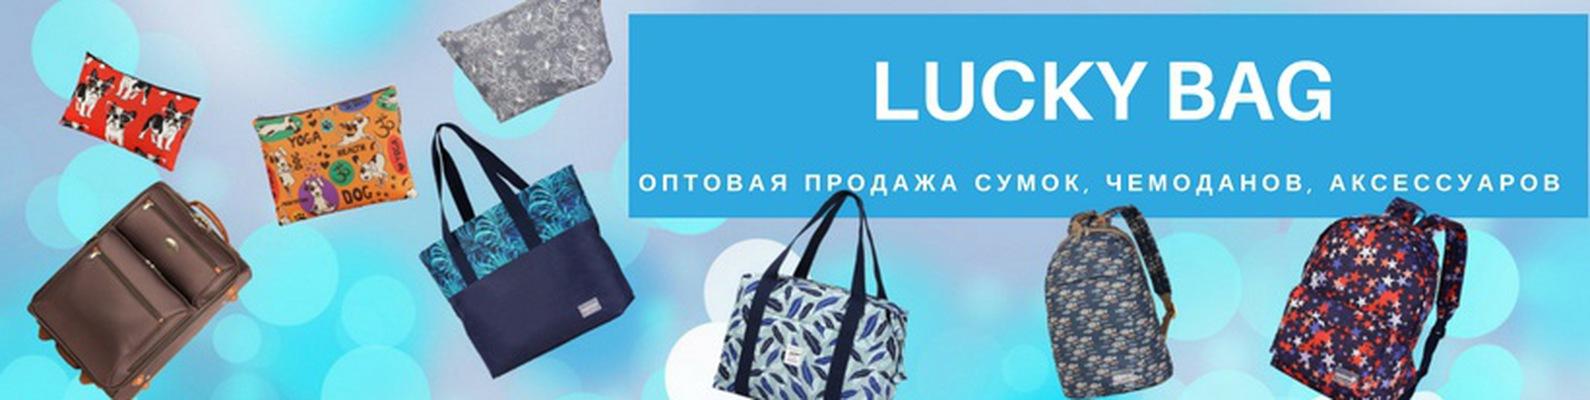 ed64e3d5c52e LUCKY BAG - сумки оптом   ВКонтакте